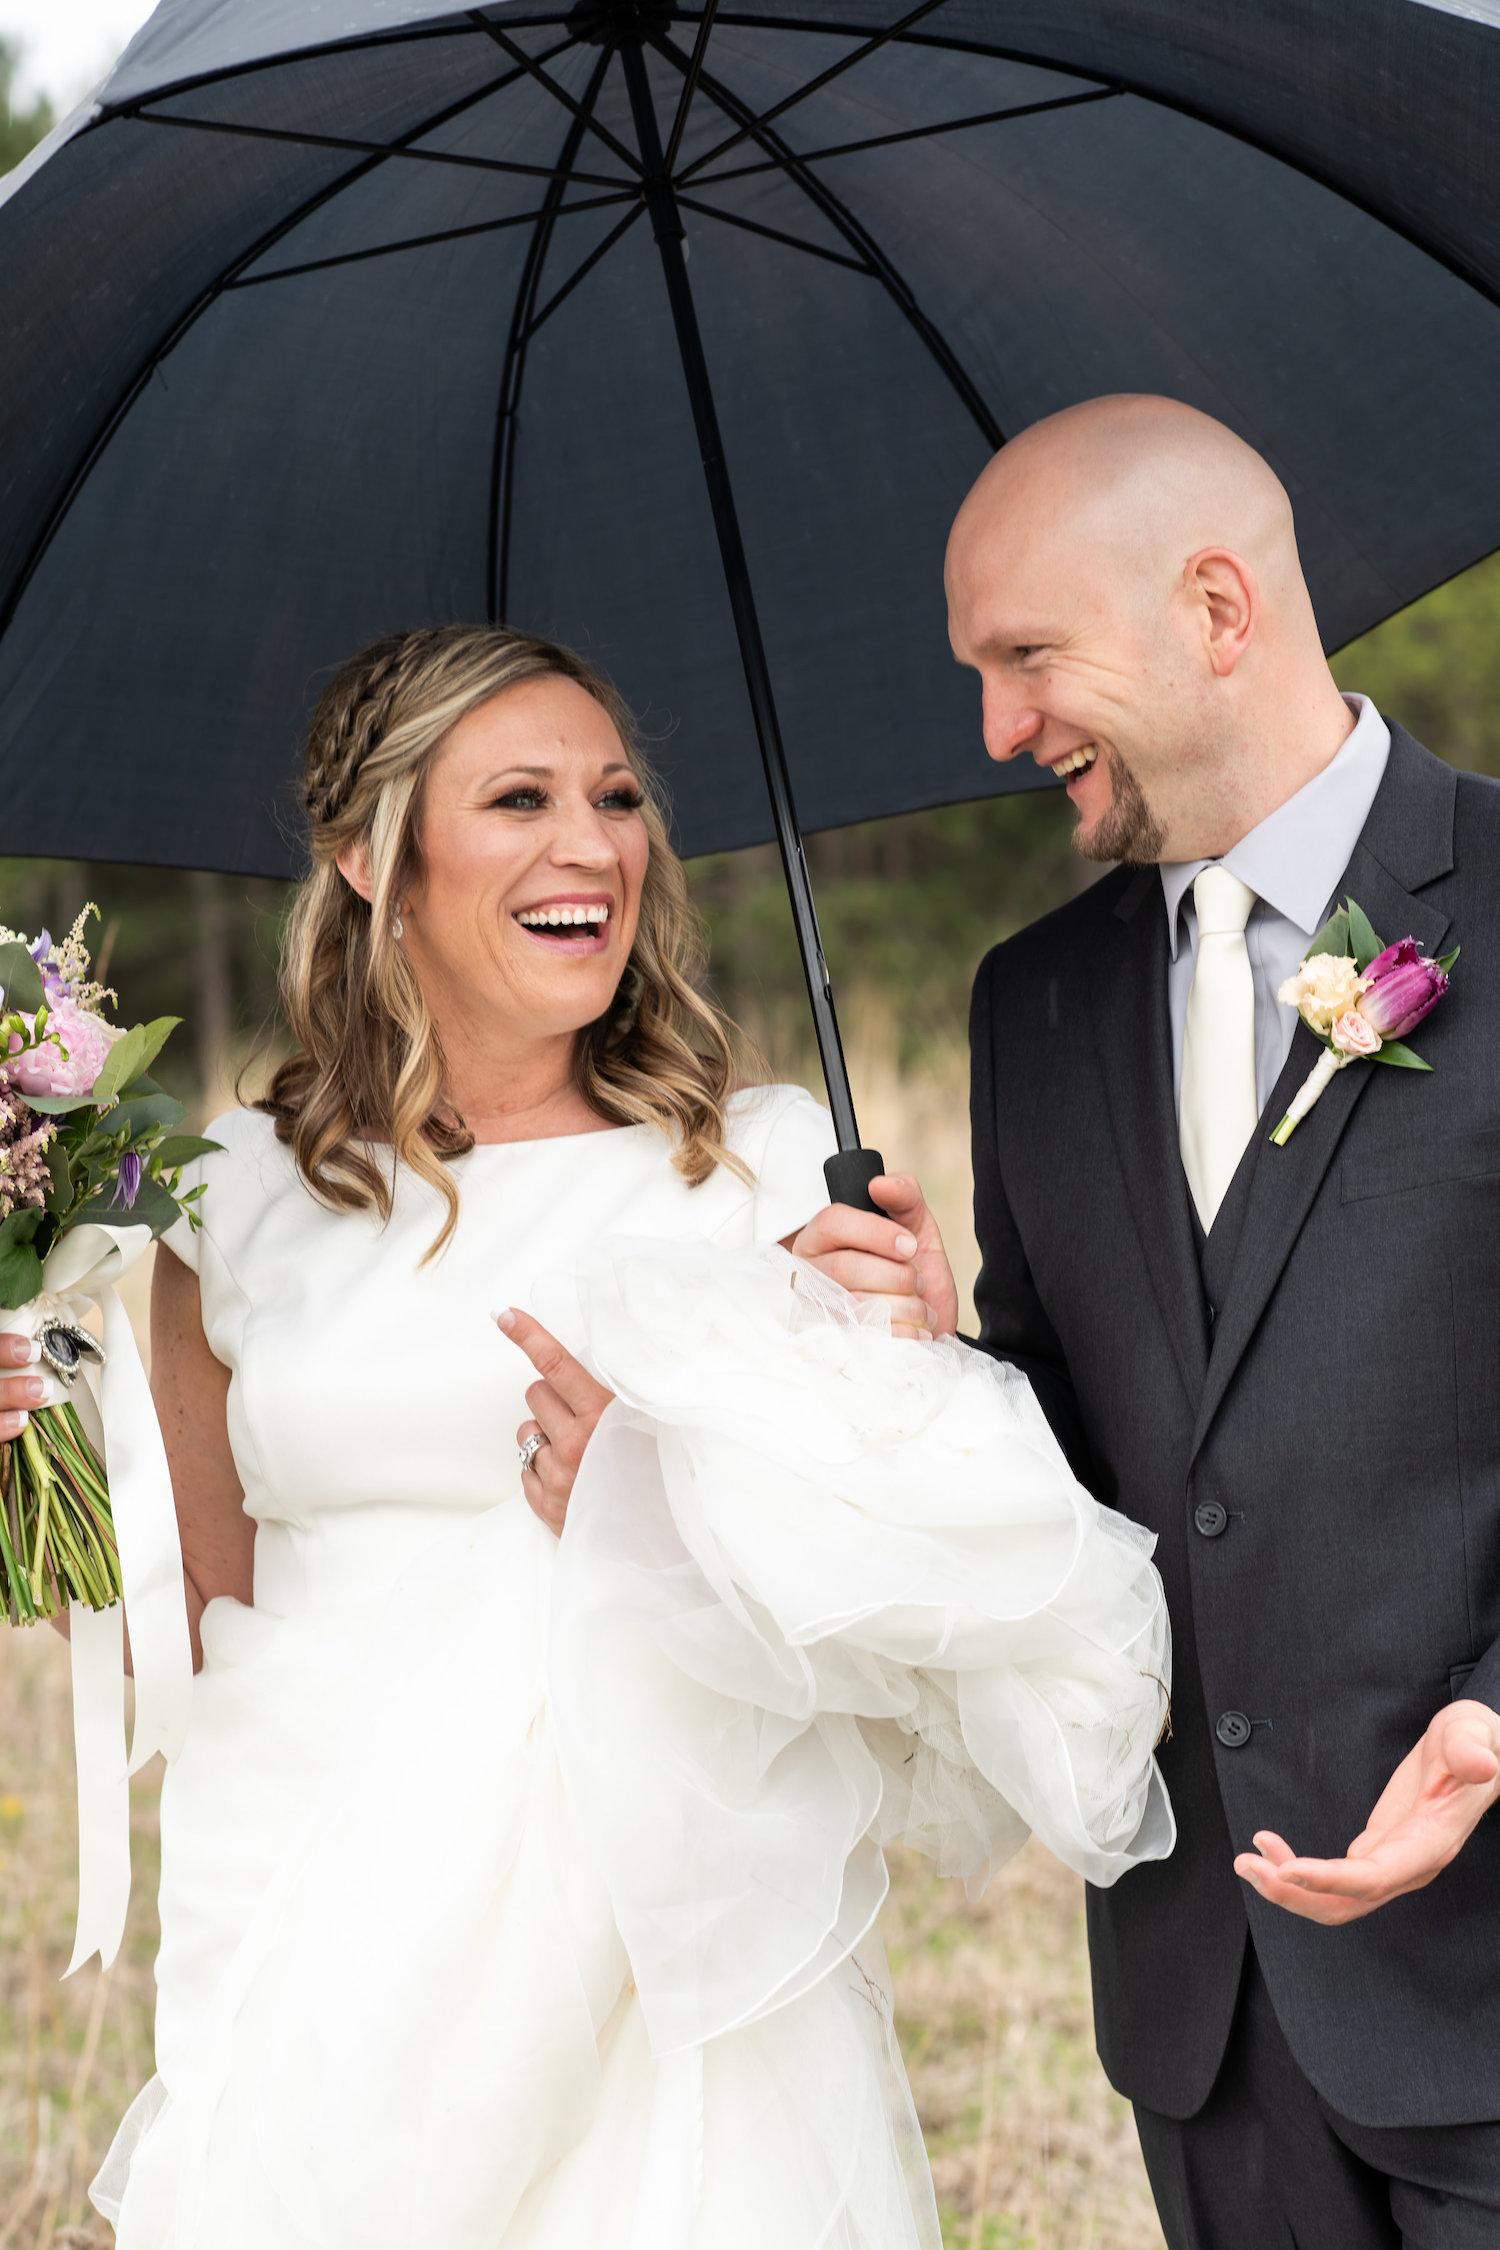 Sarah and Mark | Hope Glen Farm | Kelly Birch Photo | Sixpence Events & Planning wedding planning in Minnesota32.jpg